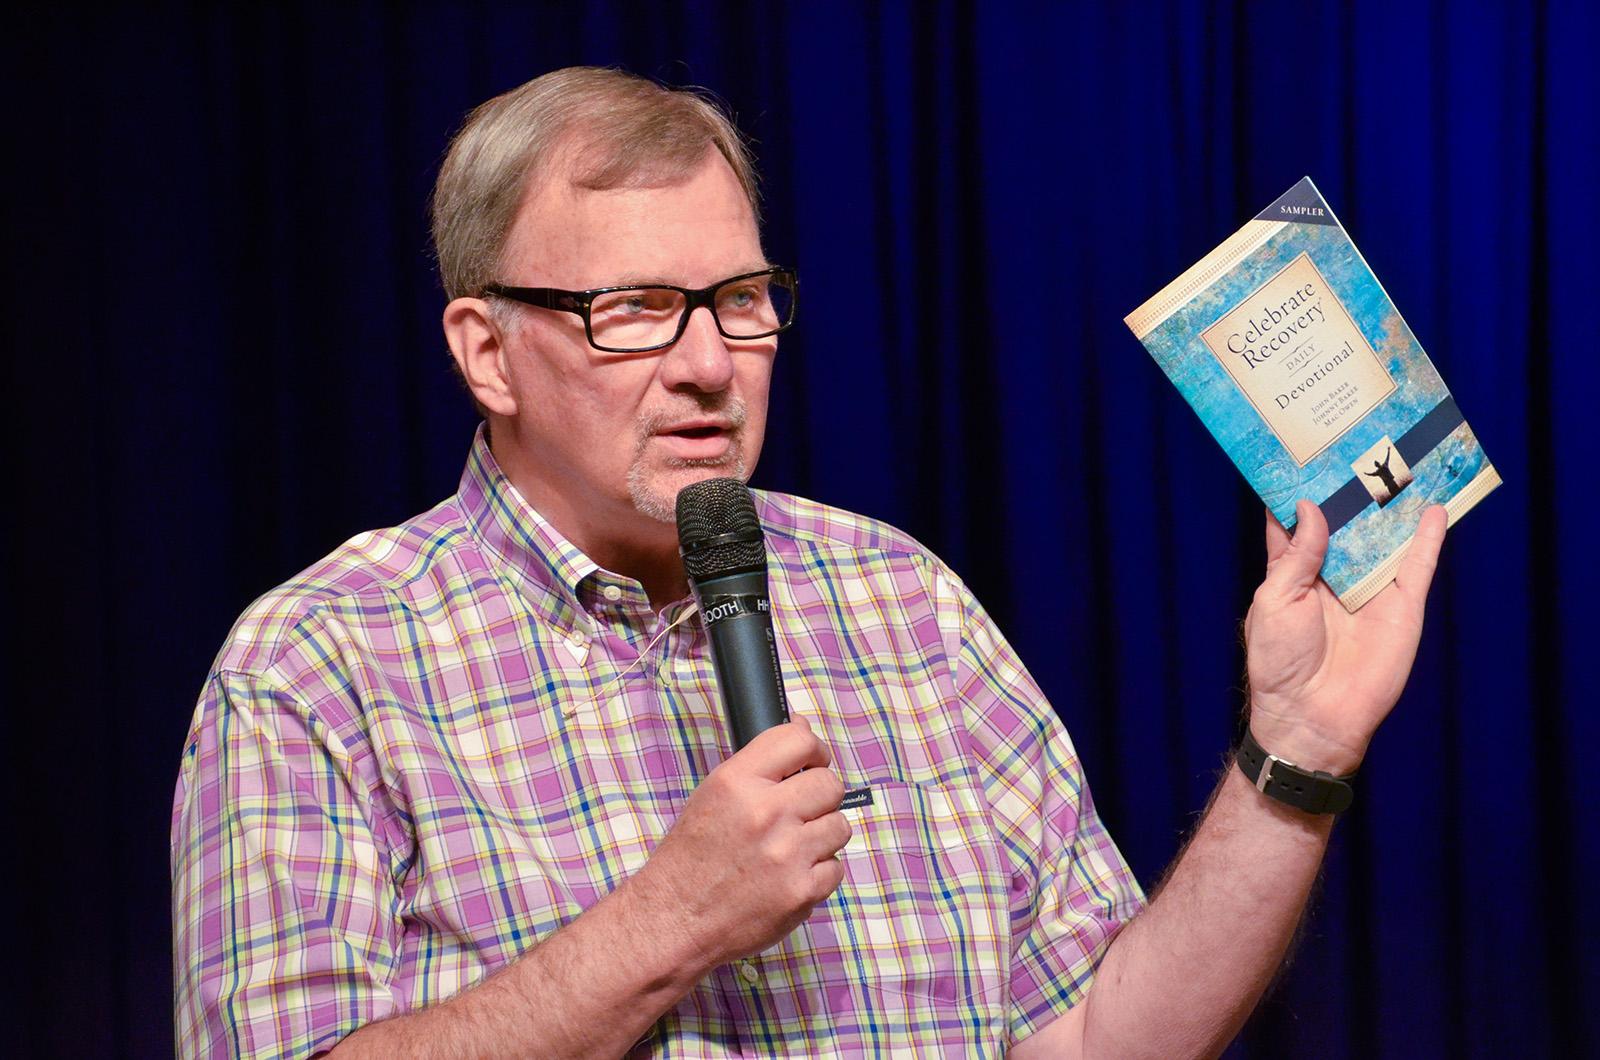 Celebrate Recovery co-founder John Baker speaks at Saddleback Church in Lake Forest, California, on Aug. 13, 2013. Photo by Robert Hawkins, courtesy of Saddleback Church